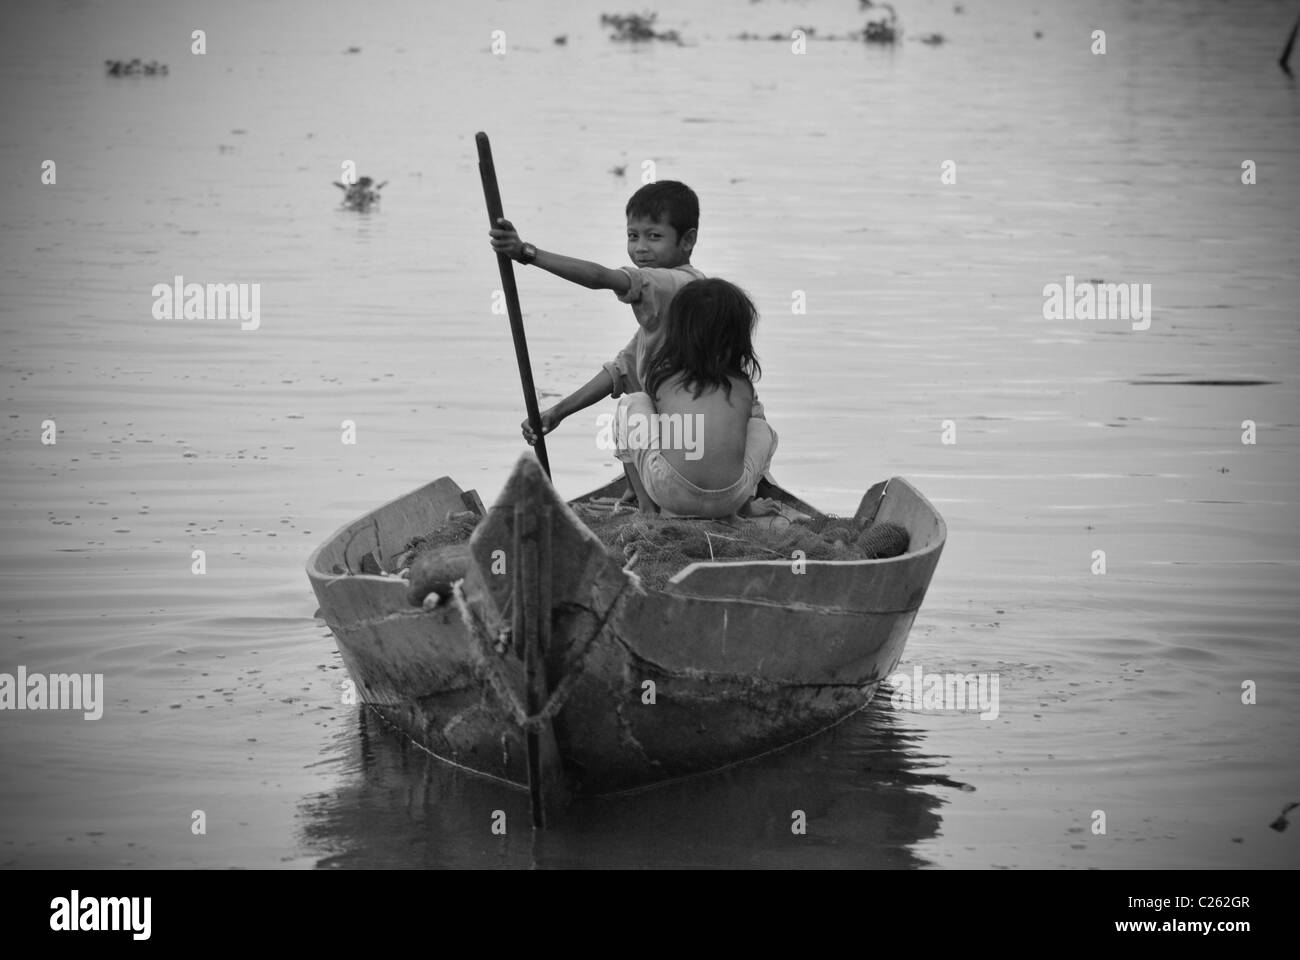 Enfants bateau à rames, lac Tonle Sap, Cambodge Photo Stock